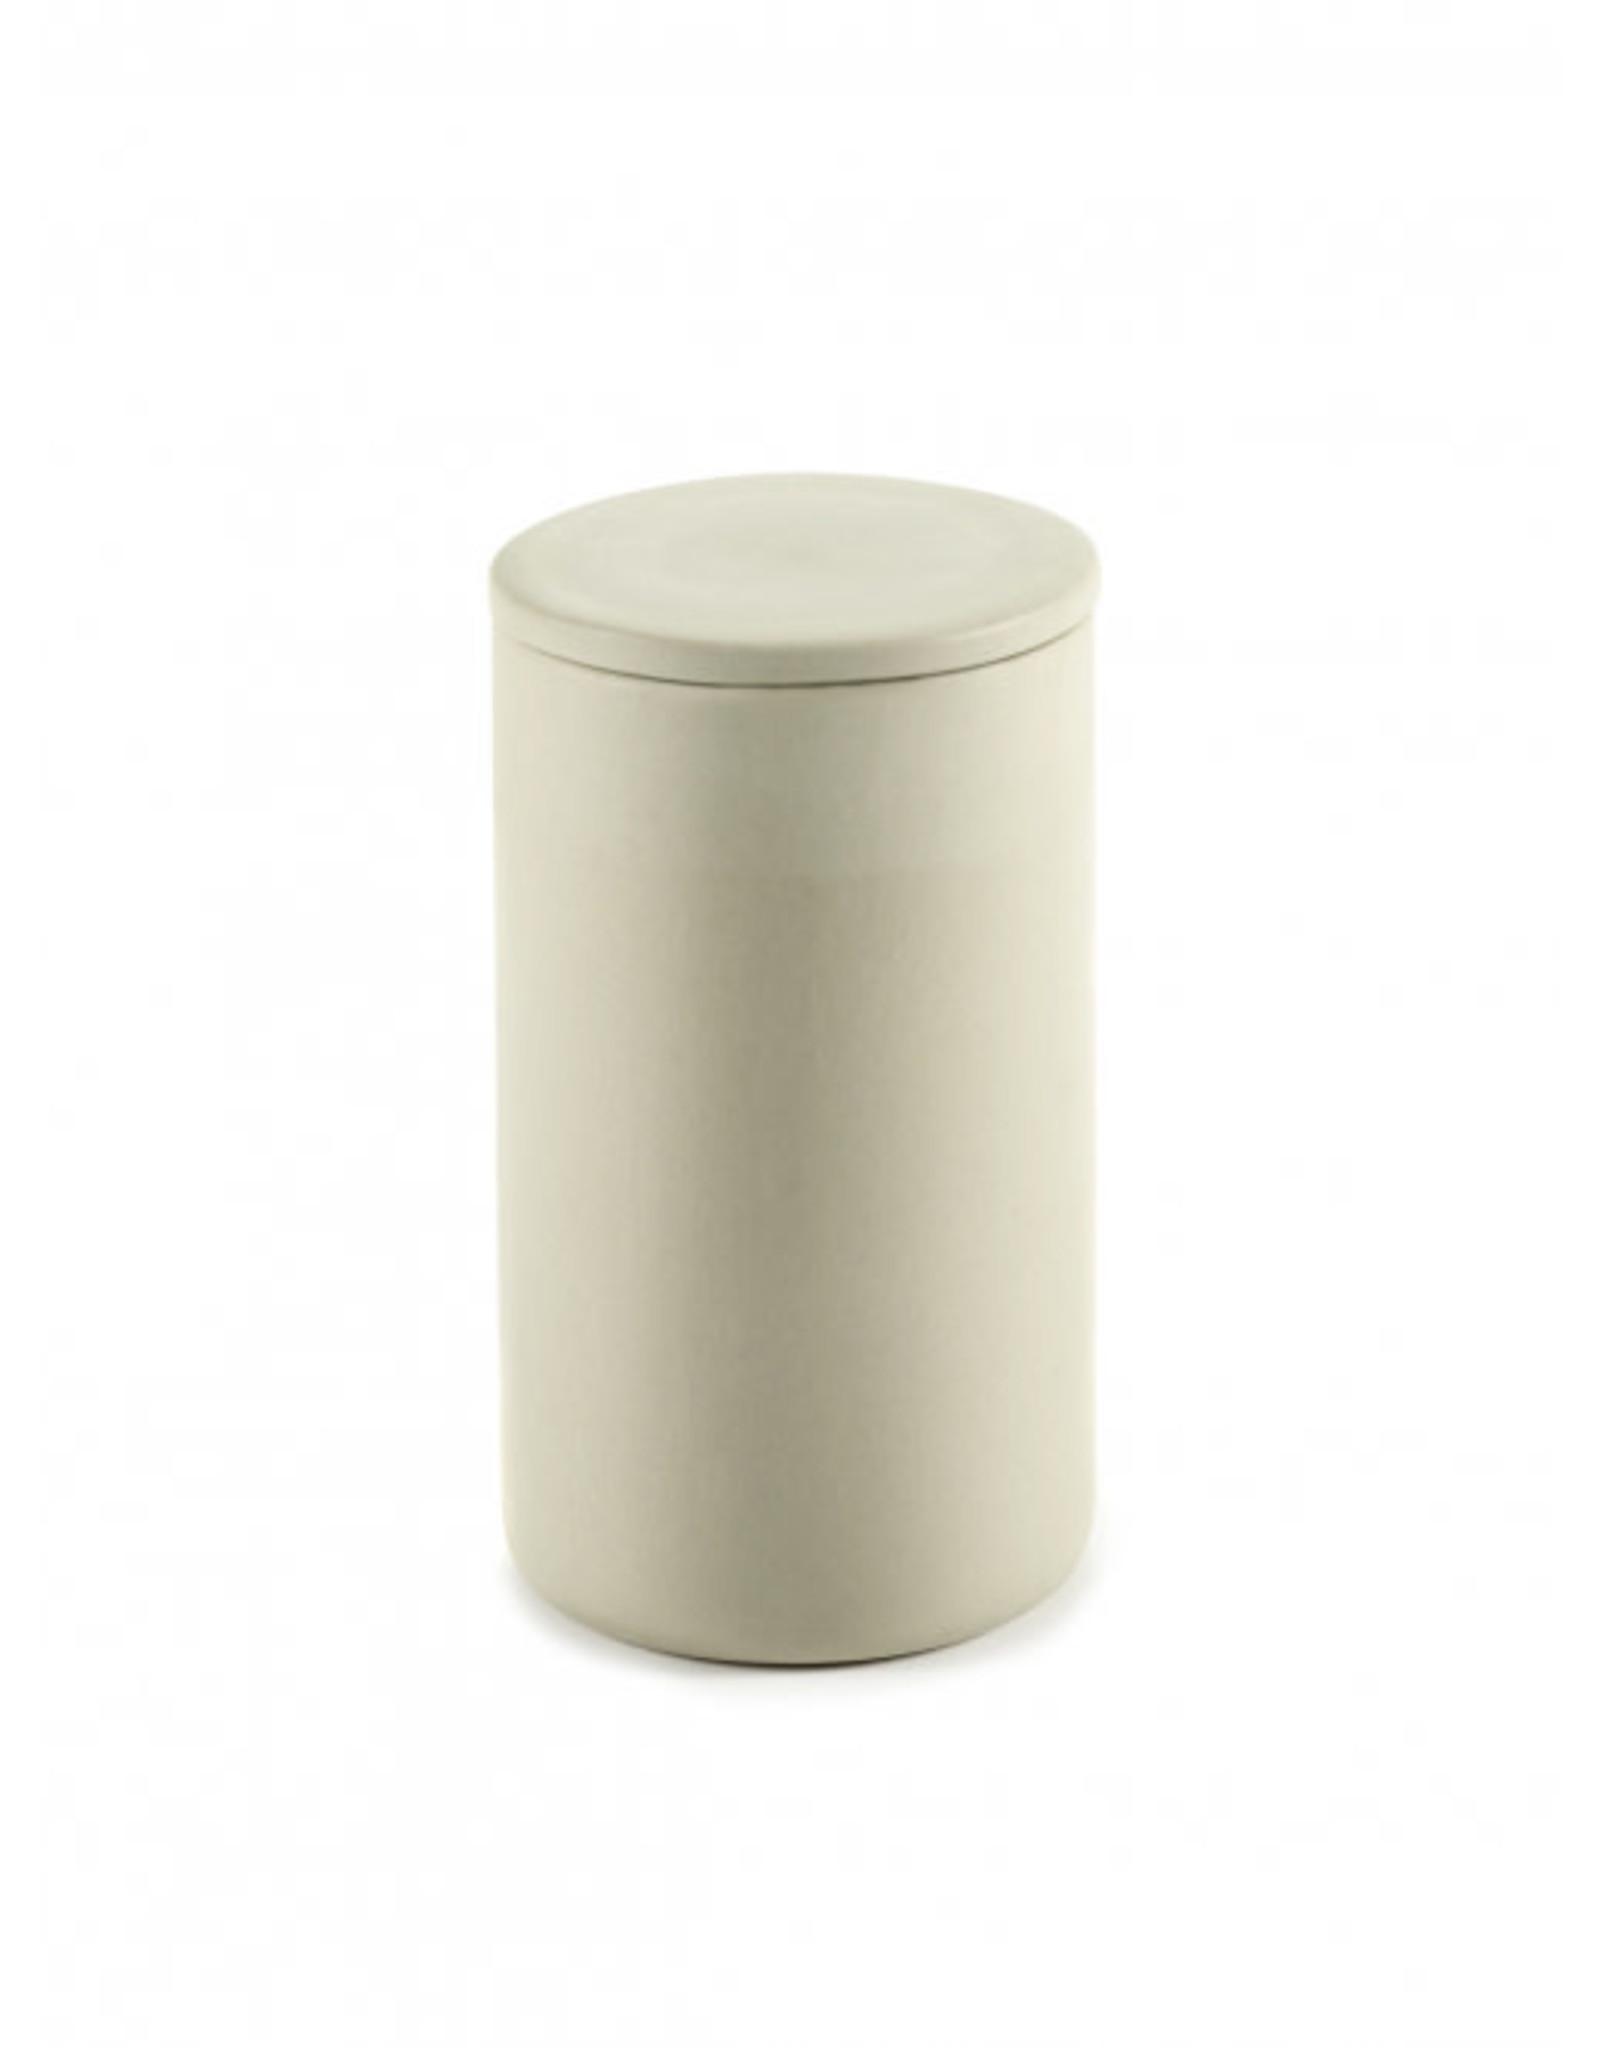 Serax NV Potje met deksel rond Cose L L7xB7xH12,6cm Beige